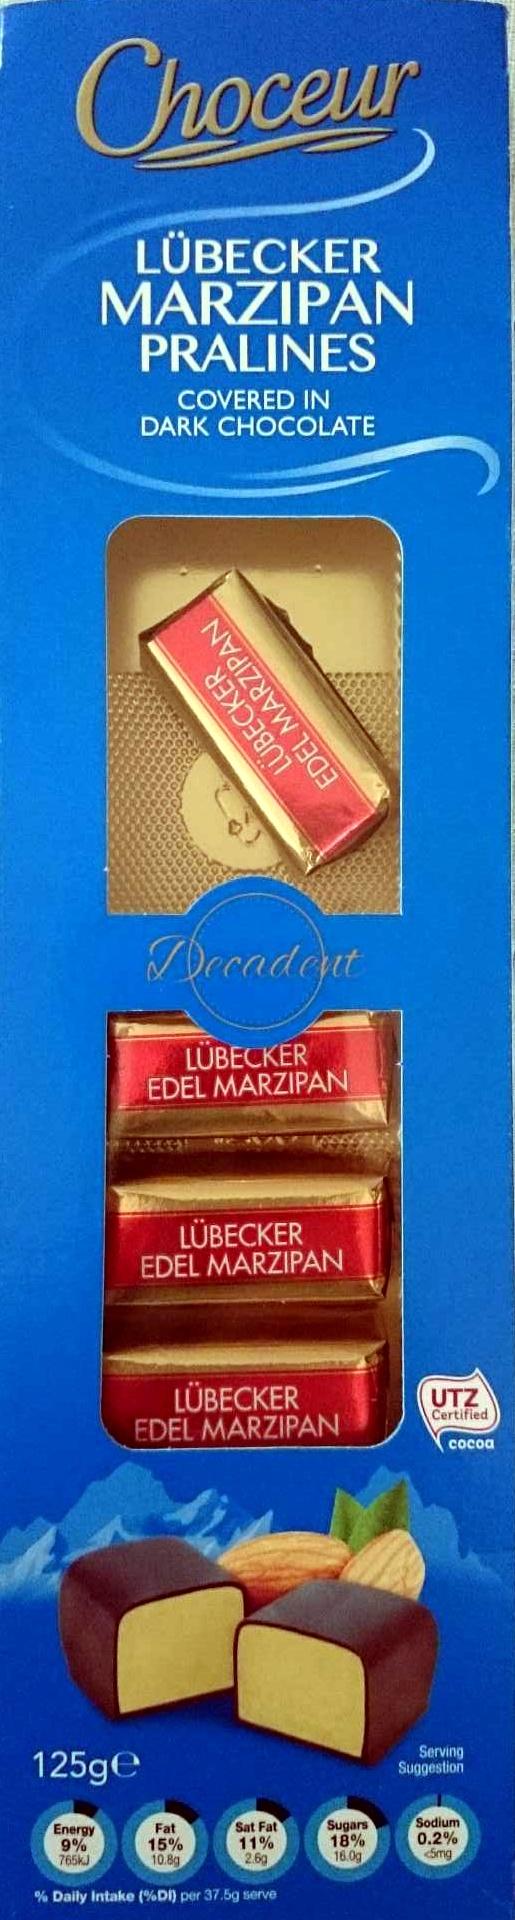 Lubecker Marzipan Pralines - Product - en